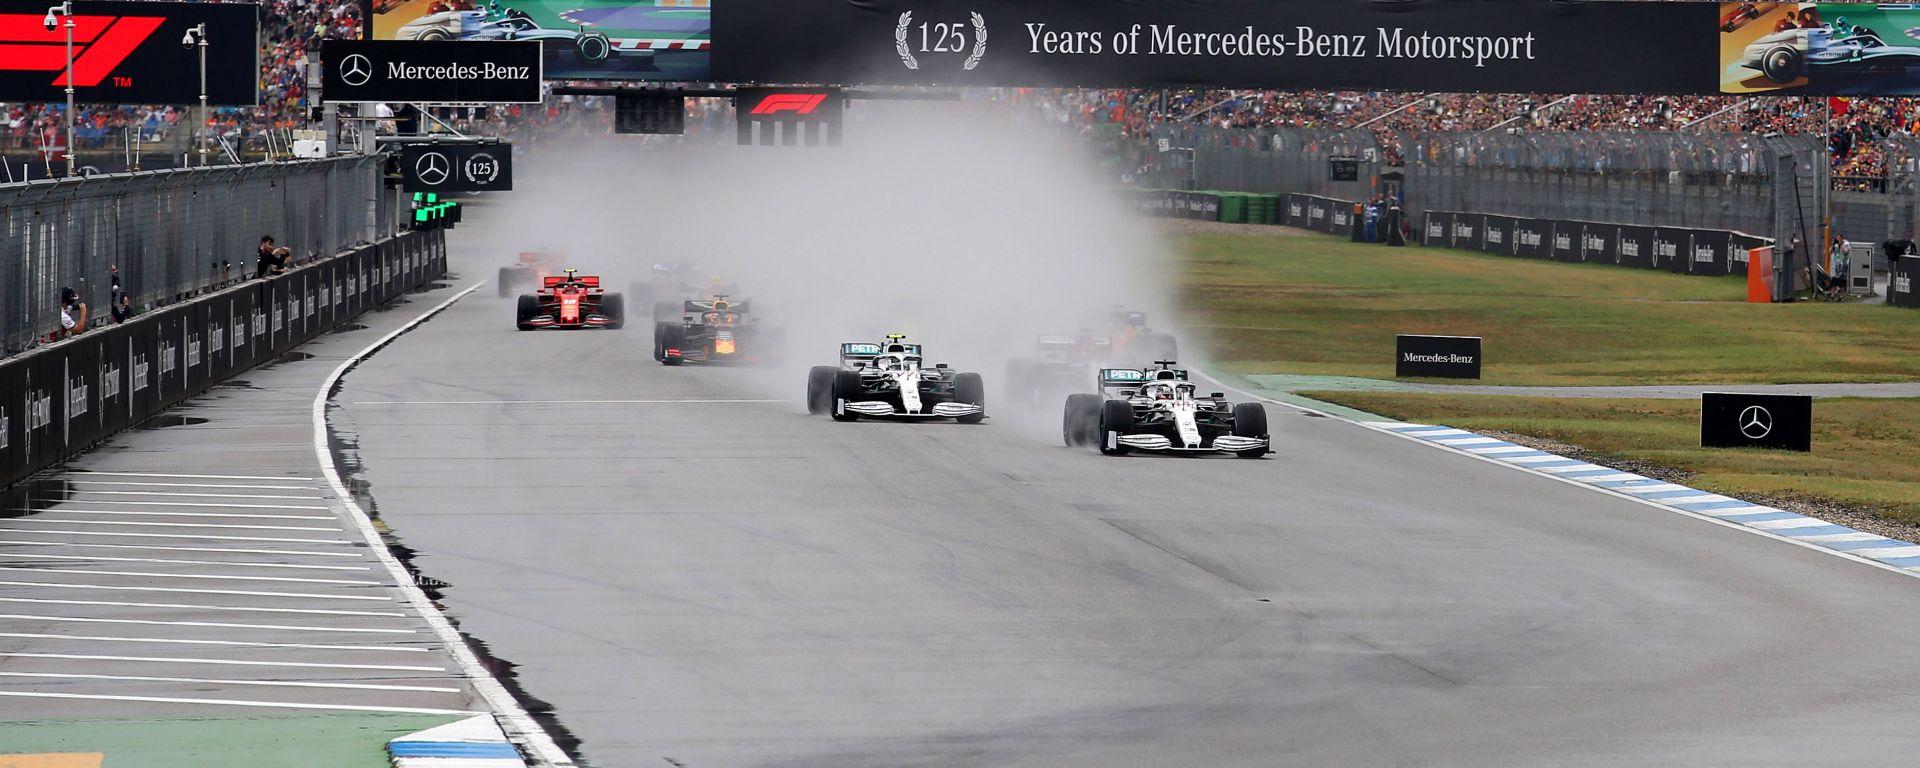 F1 GP Germania 2019, la partenza della gara a Hockenheim